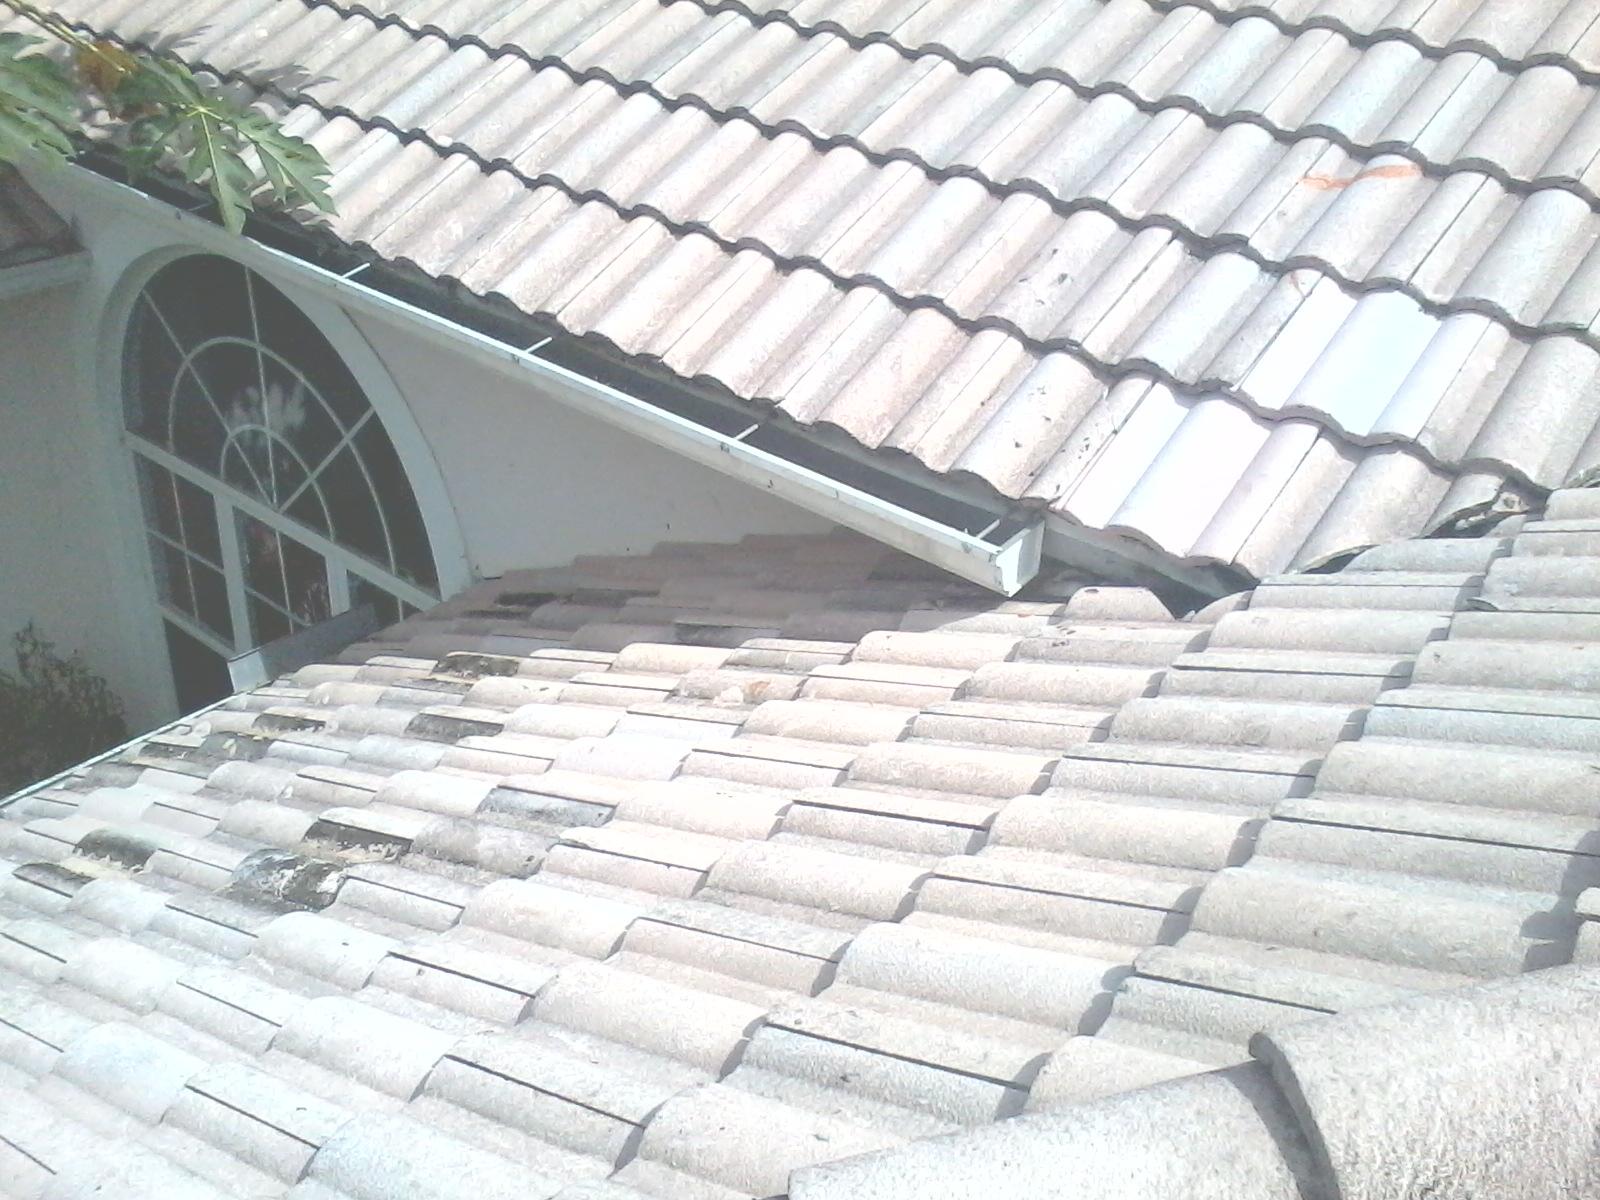 43 KWitter Repairing Roof